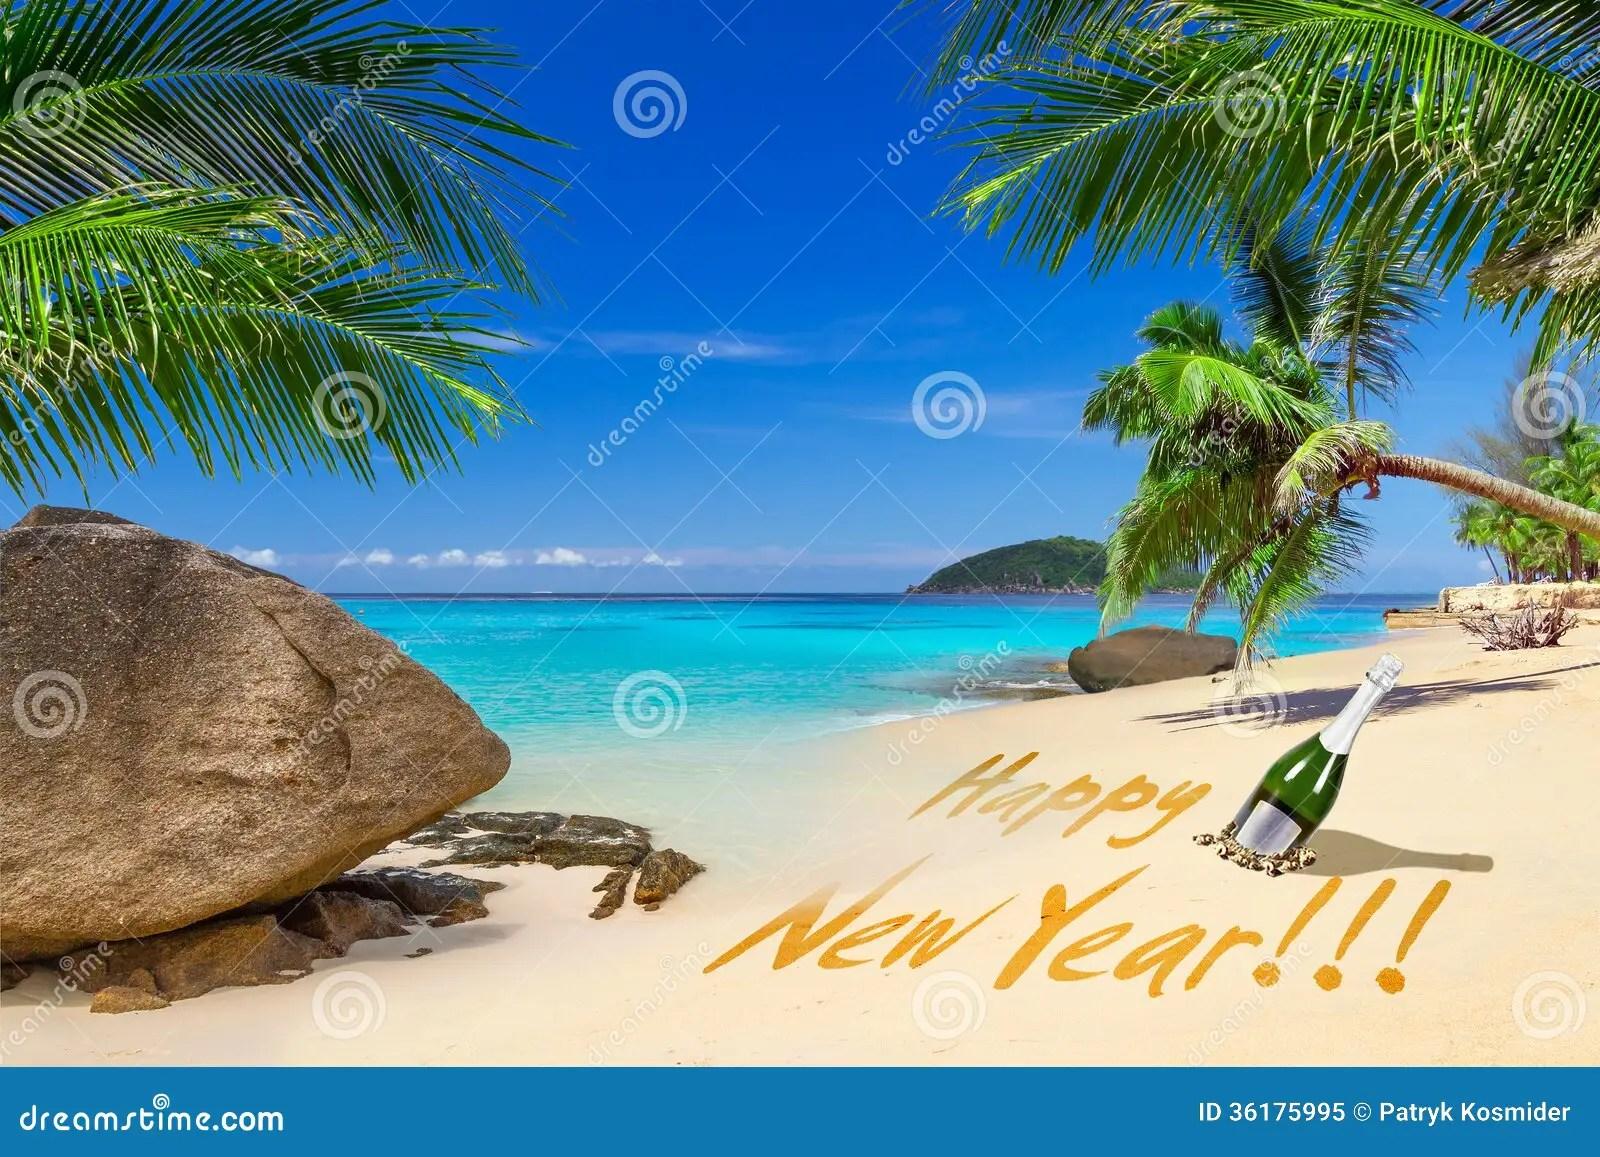 beach happy new year